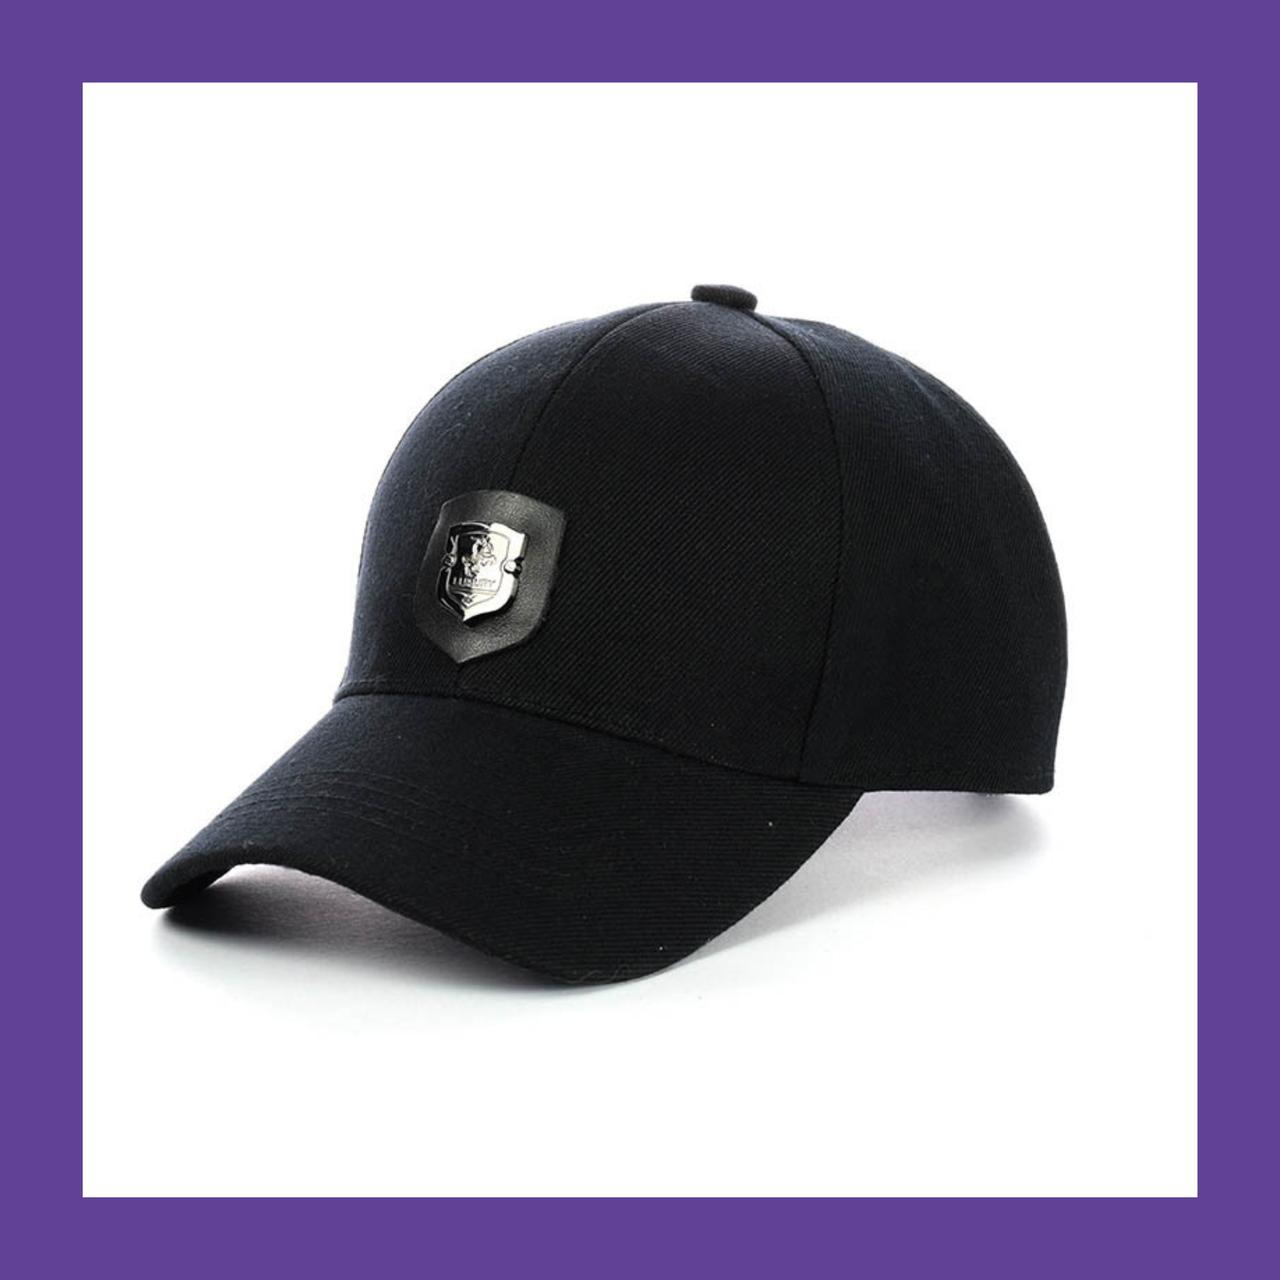 Кепка- Бейсболка черная luxury